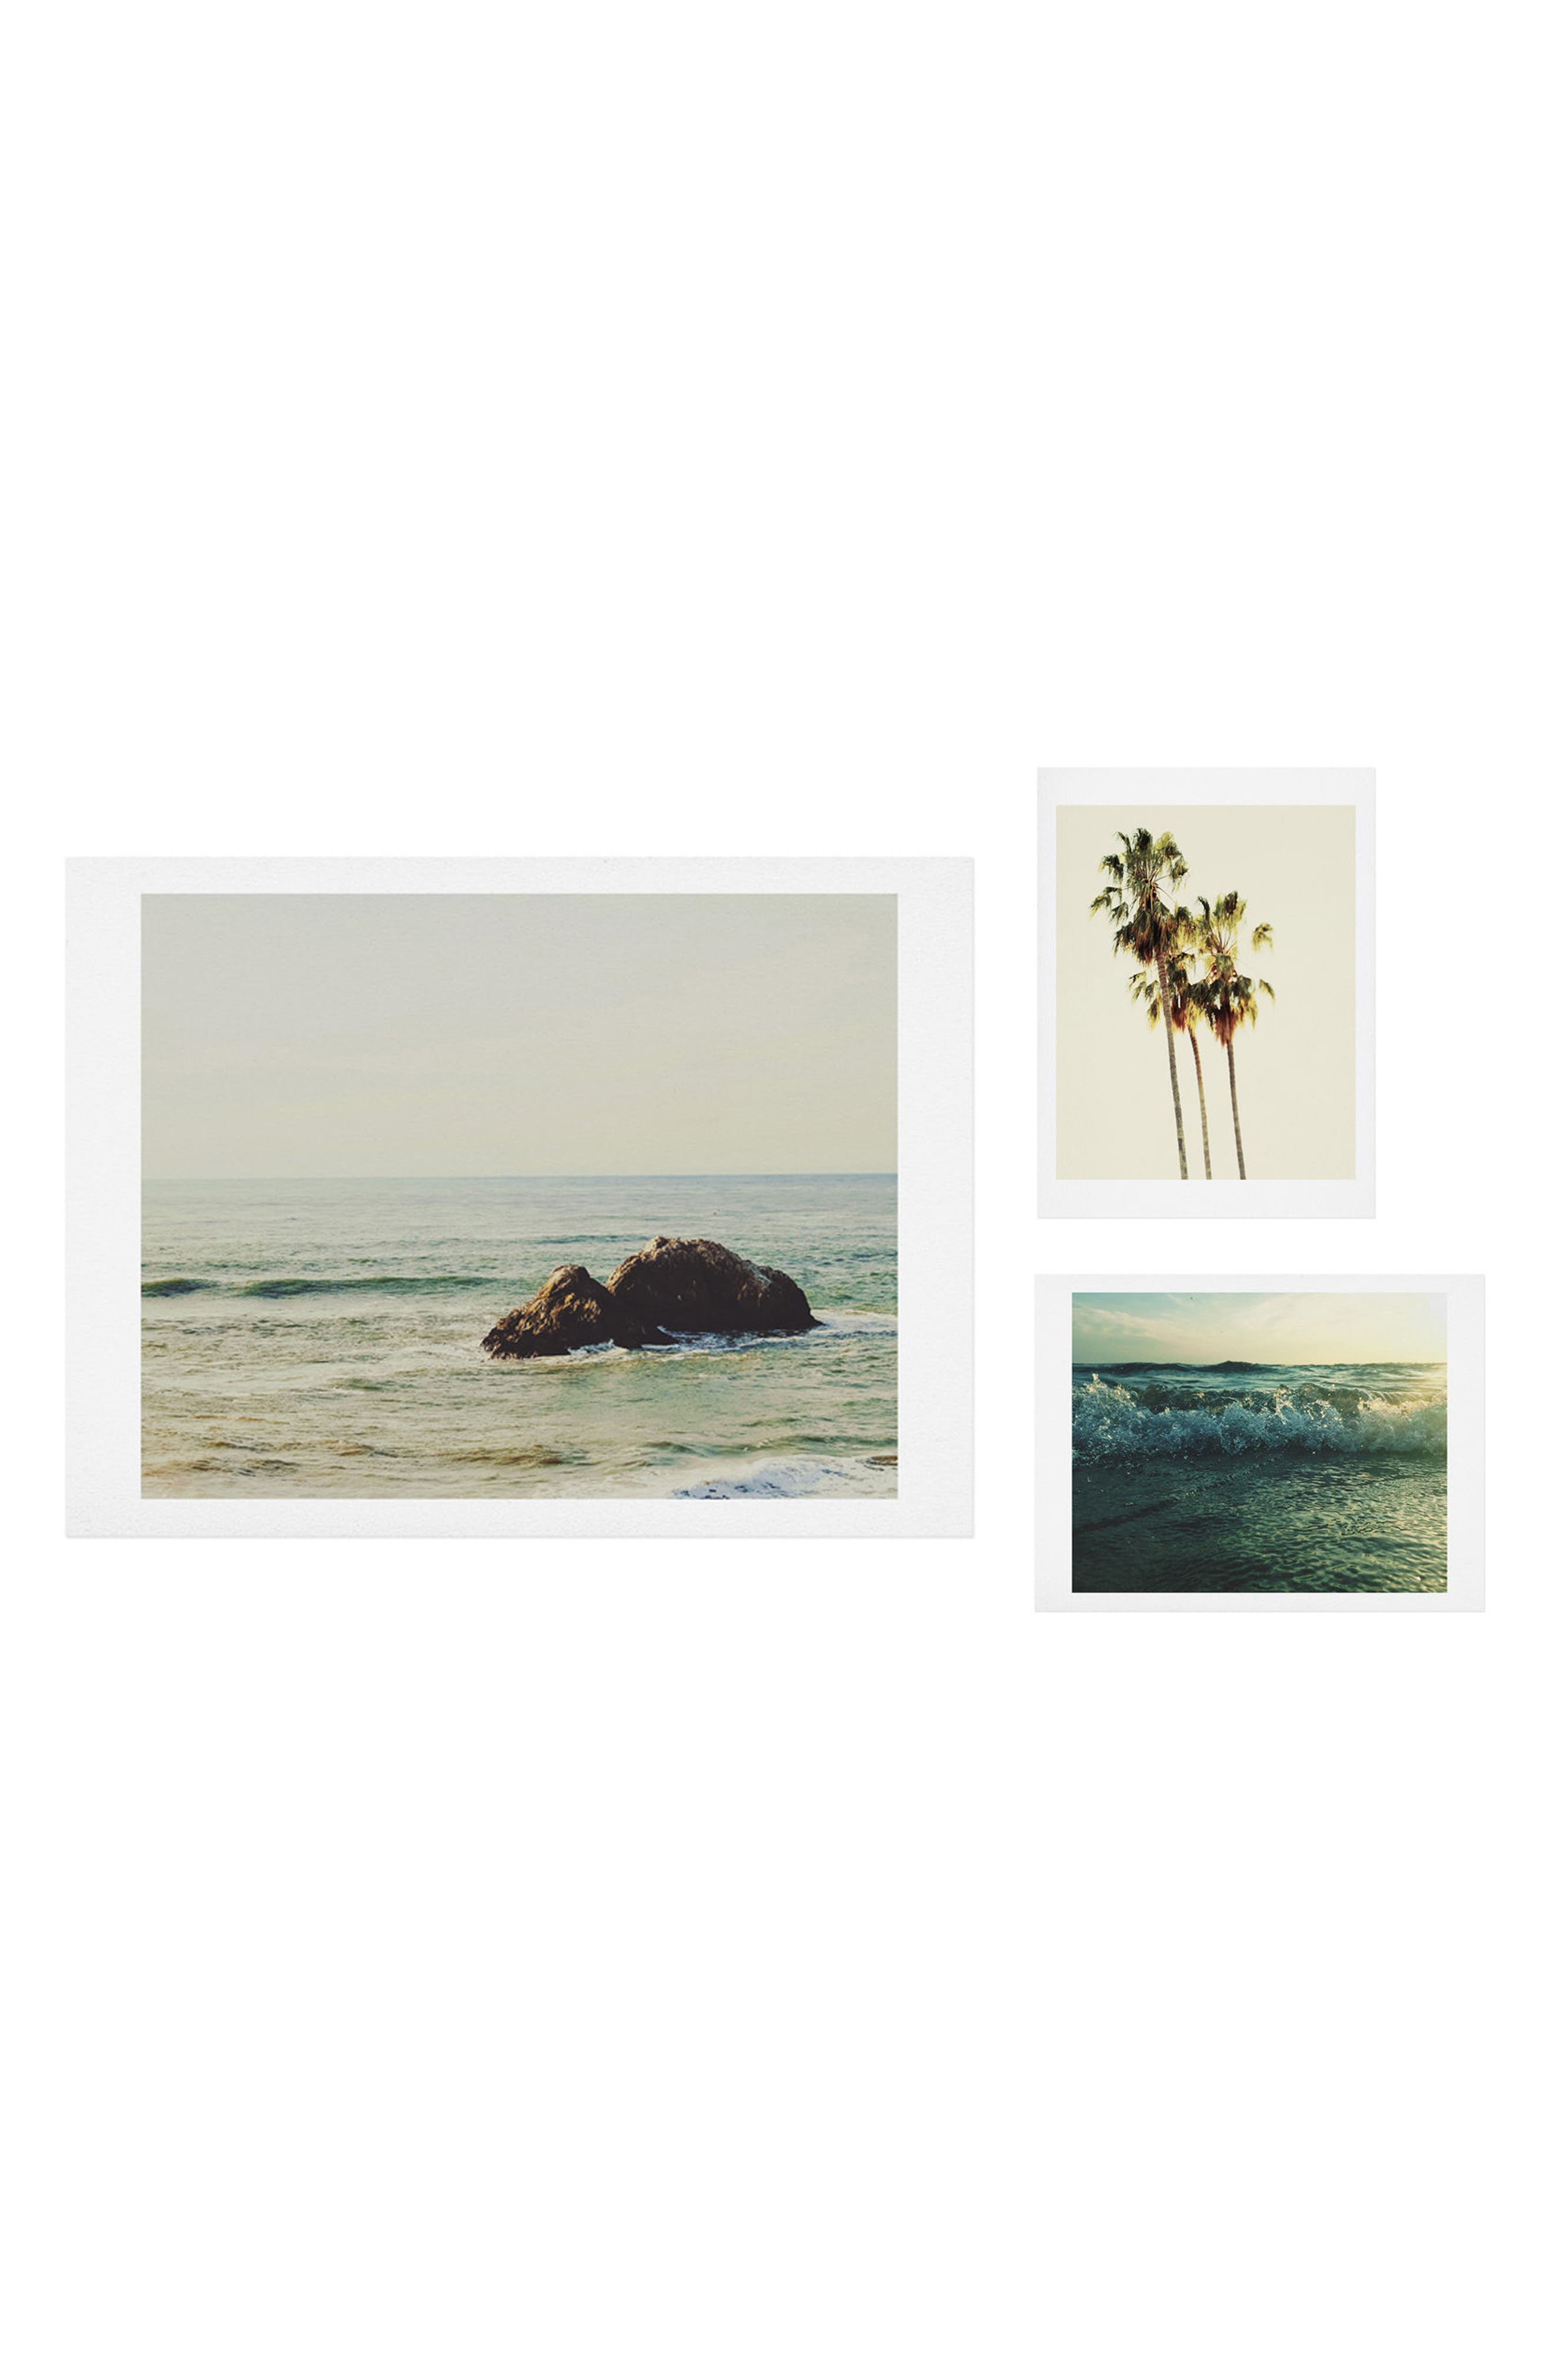 Deny Designs Ocean Calling 3-Piece Gallery Wall Art Print Set